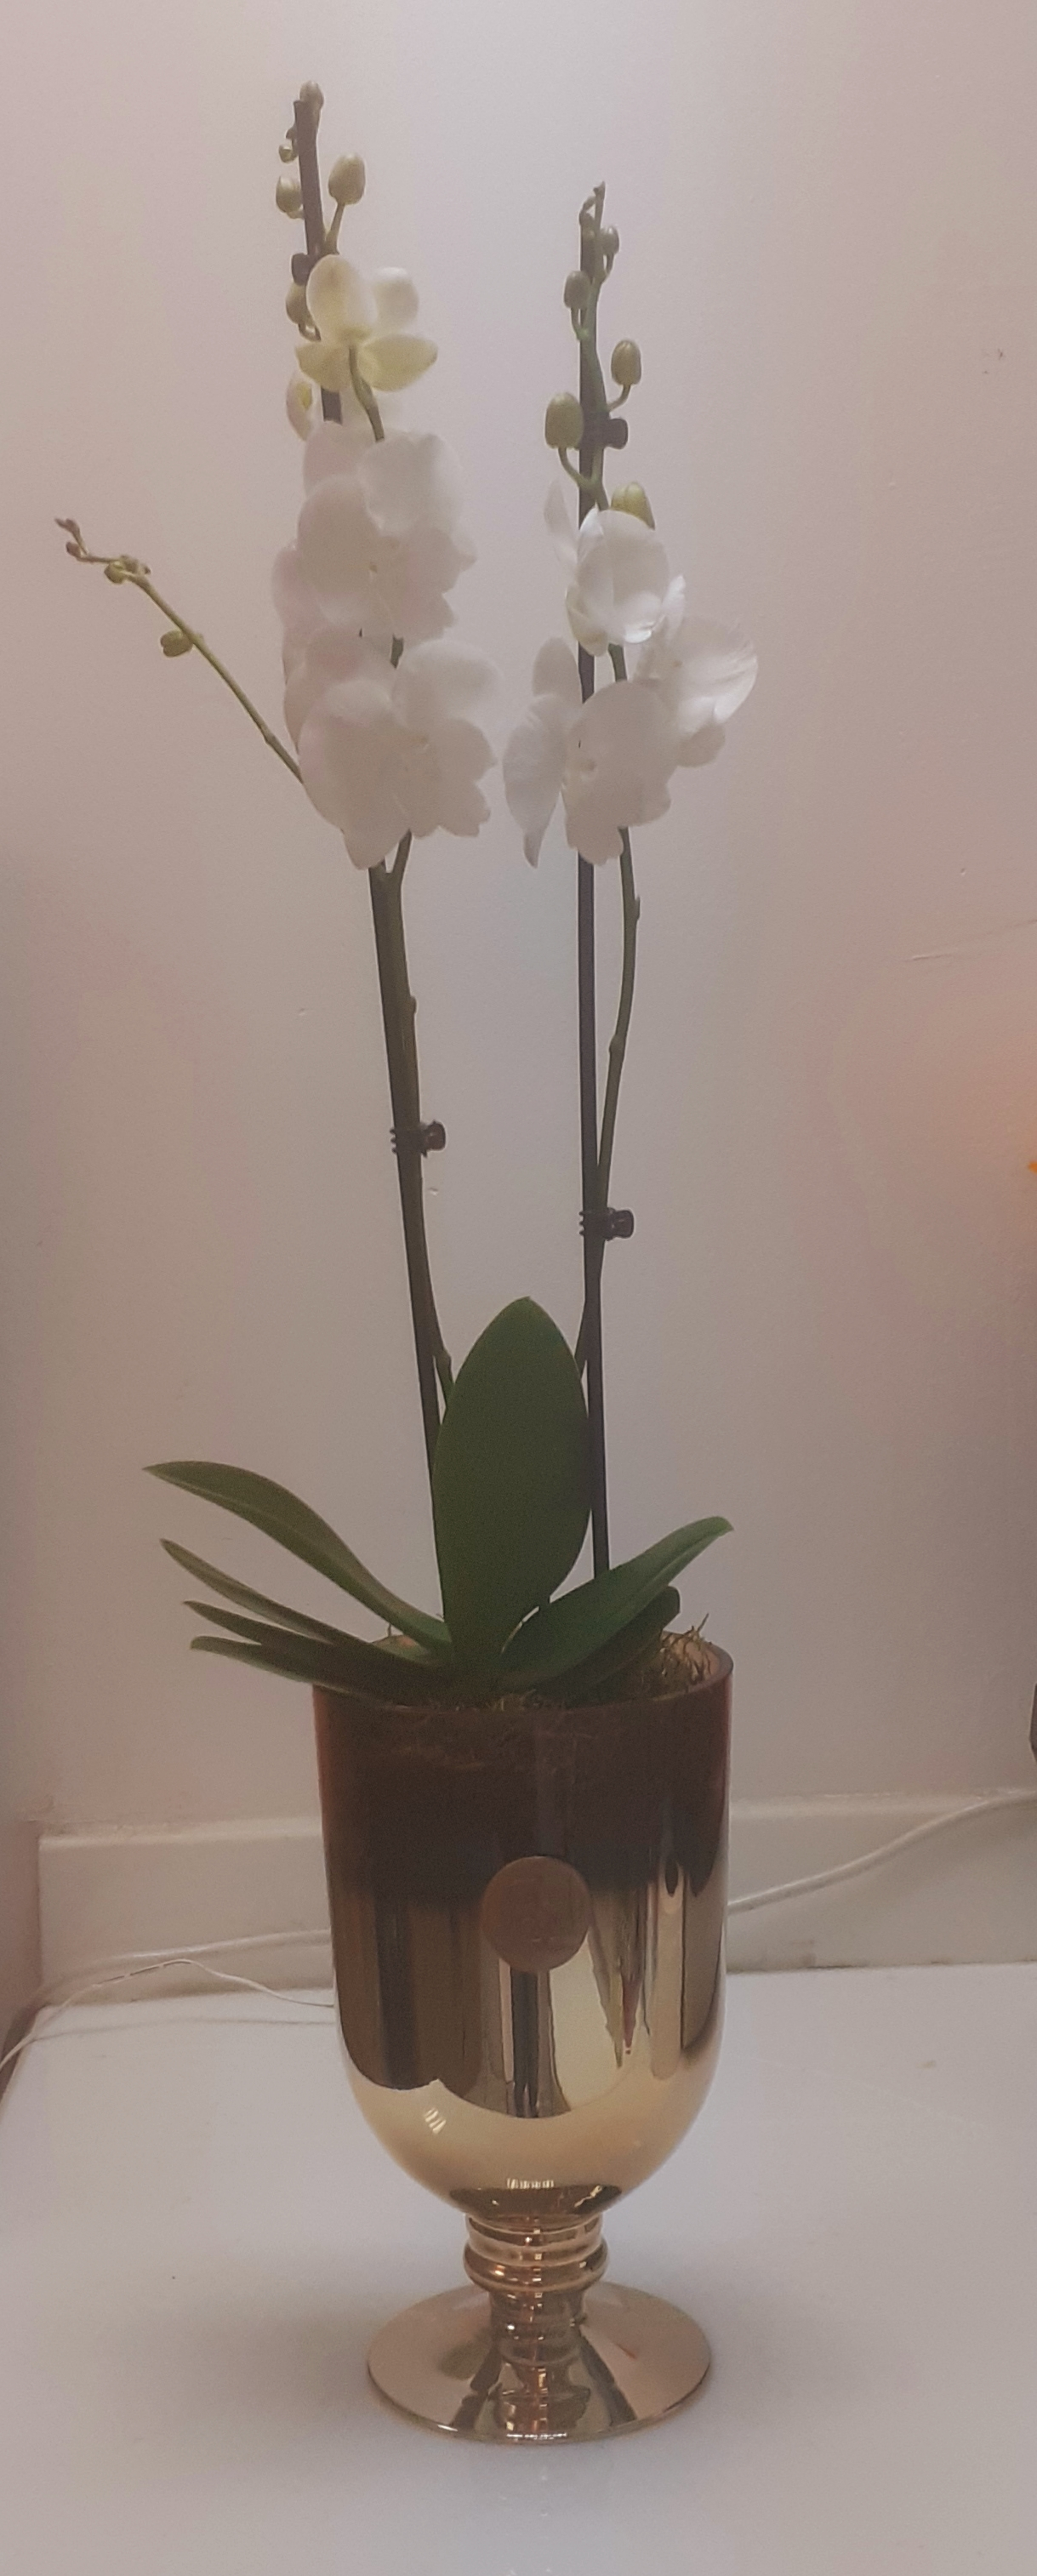 Orchid In Gold Vase Indoor Plants